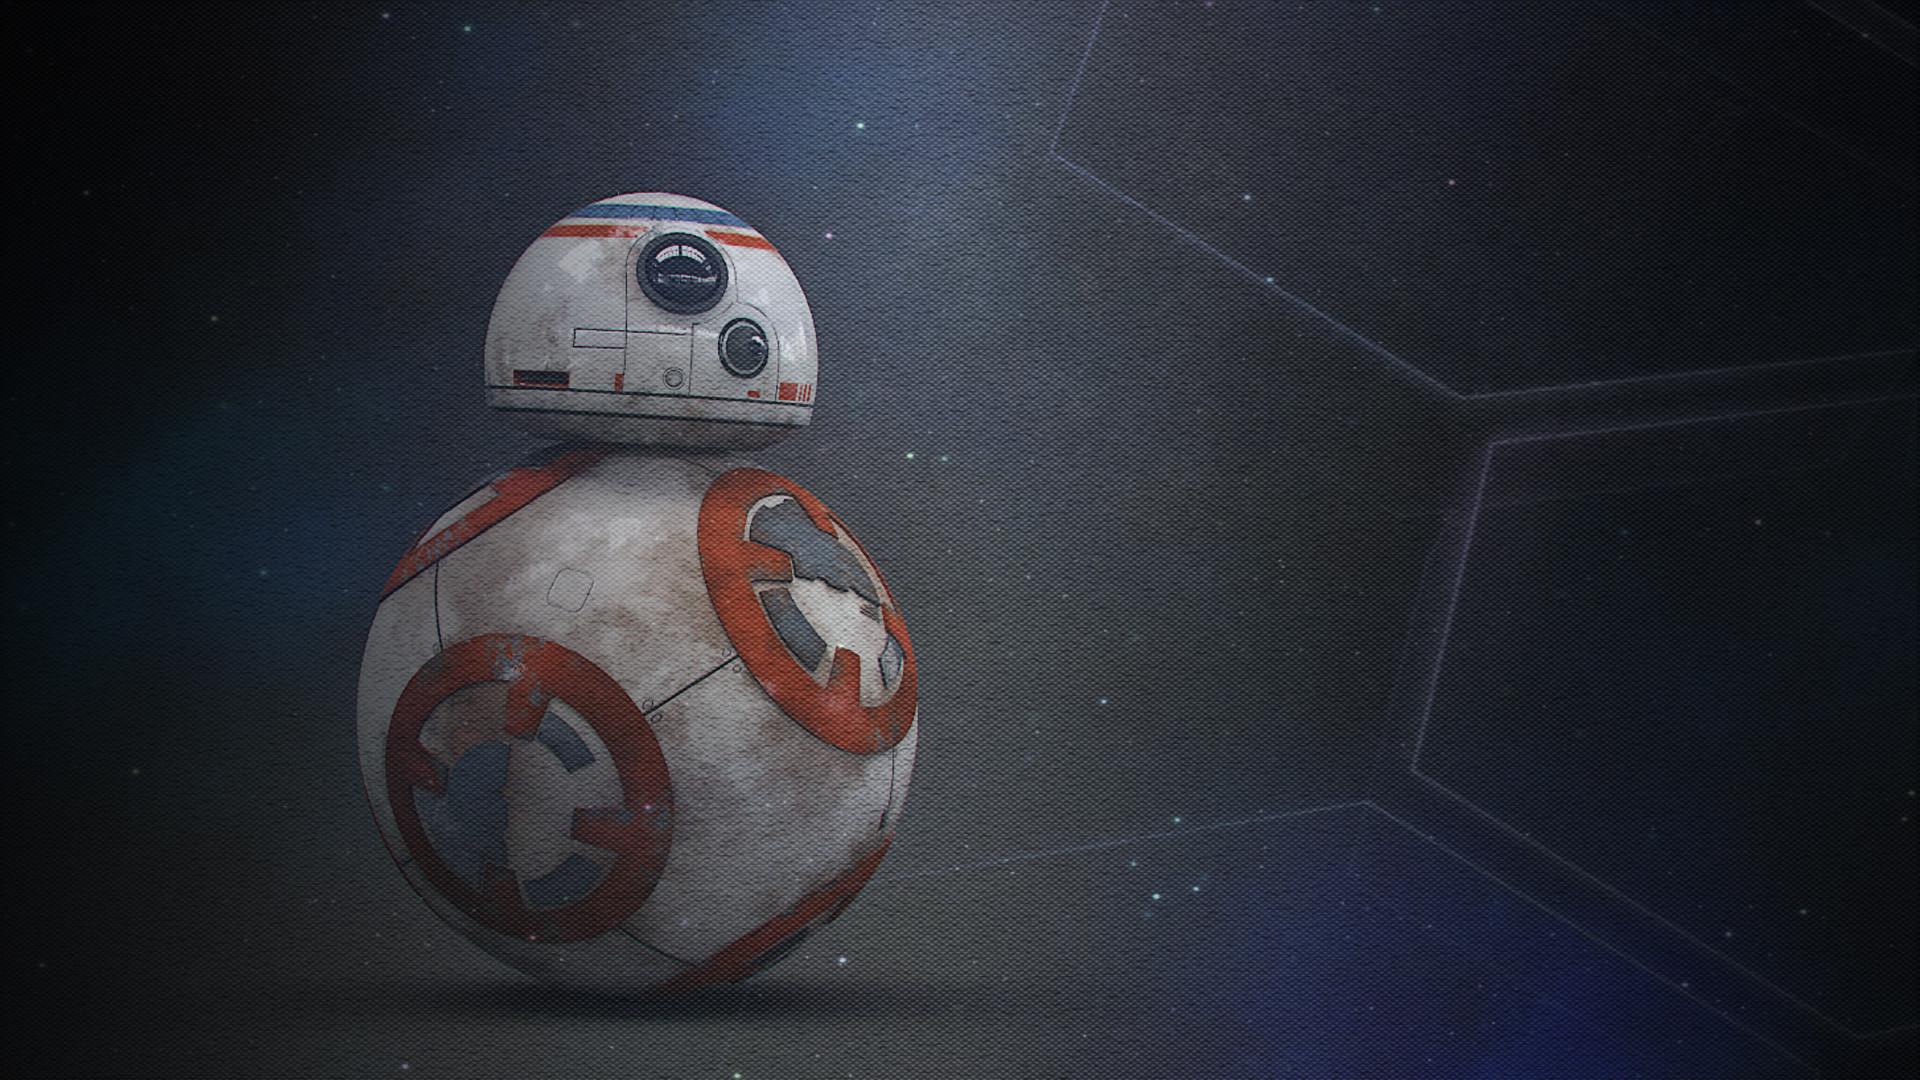 … Star Wars BB-8 wallpaper by xsas7